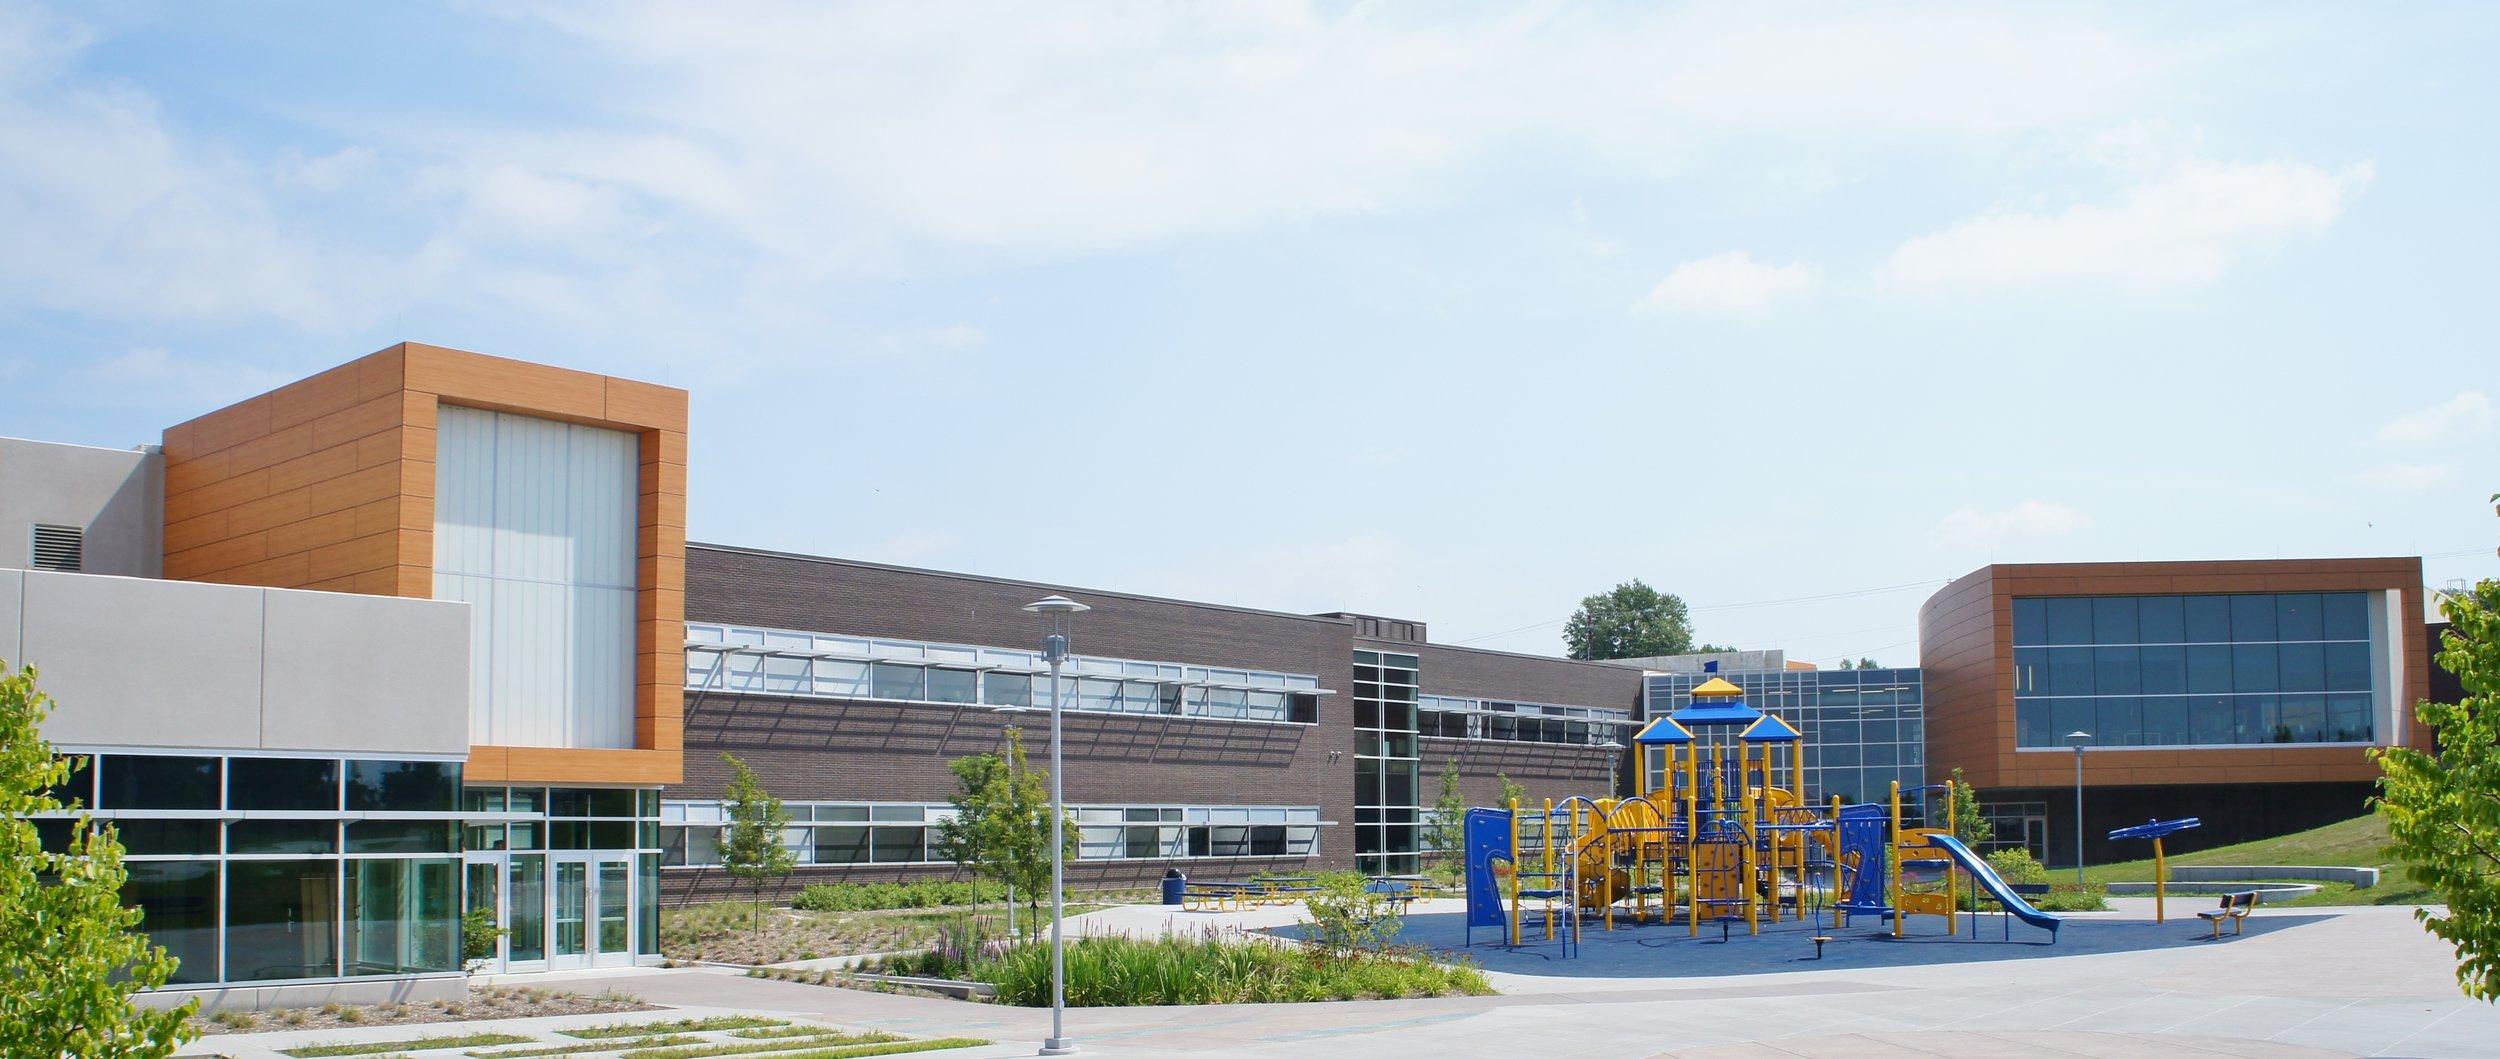 Gateway Elementary